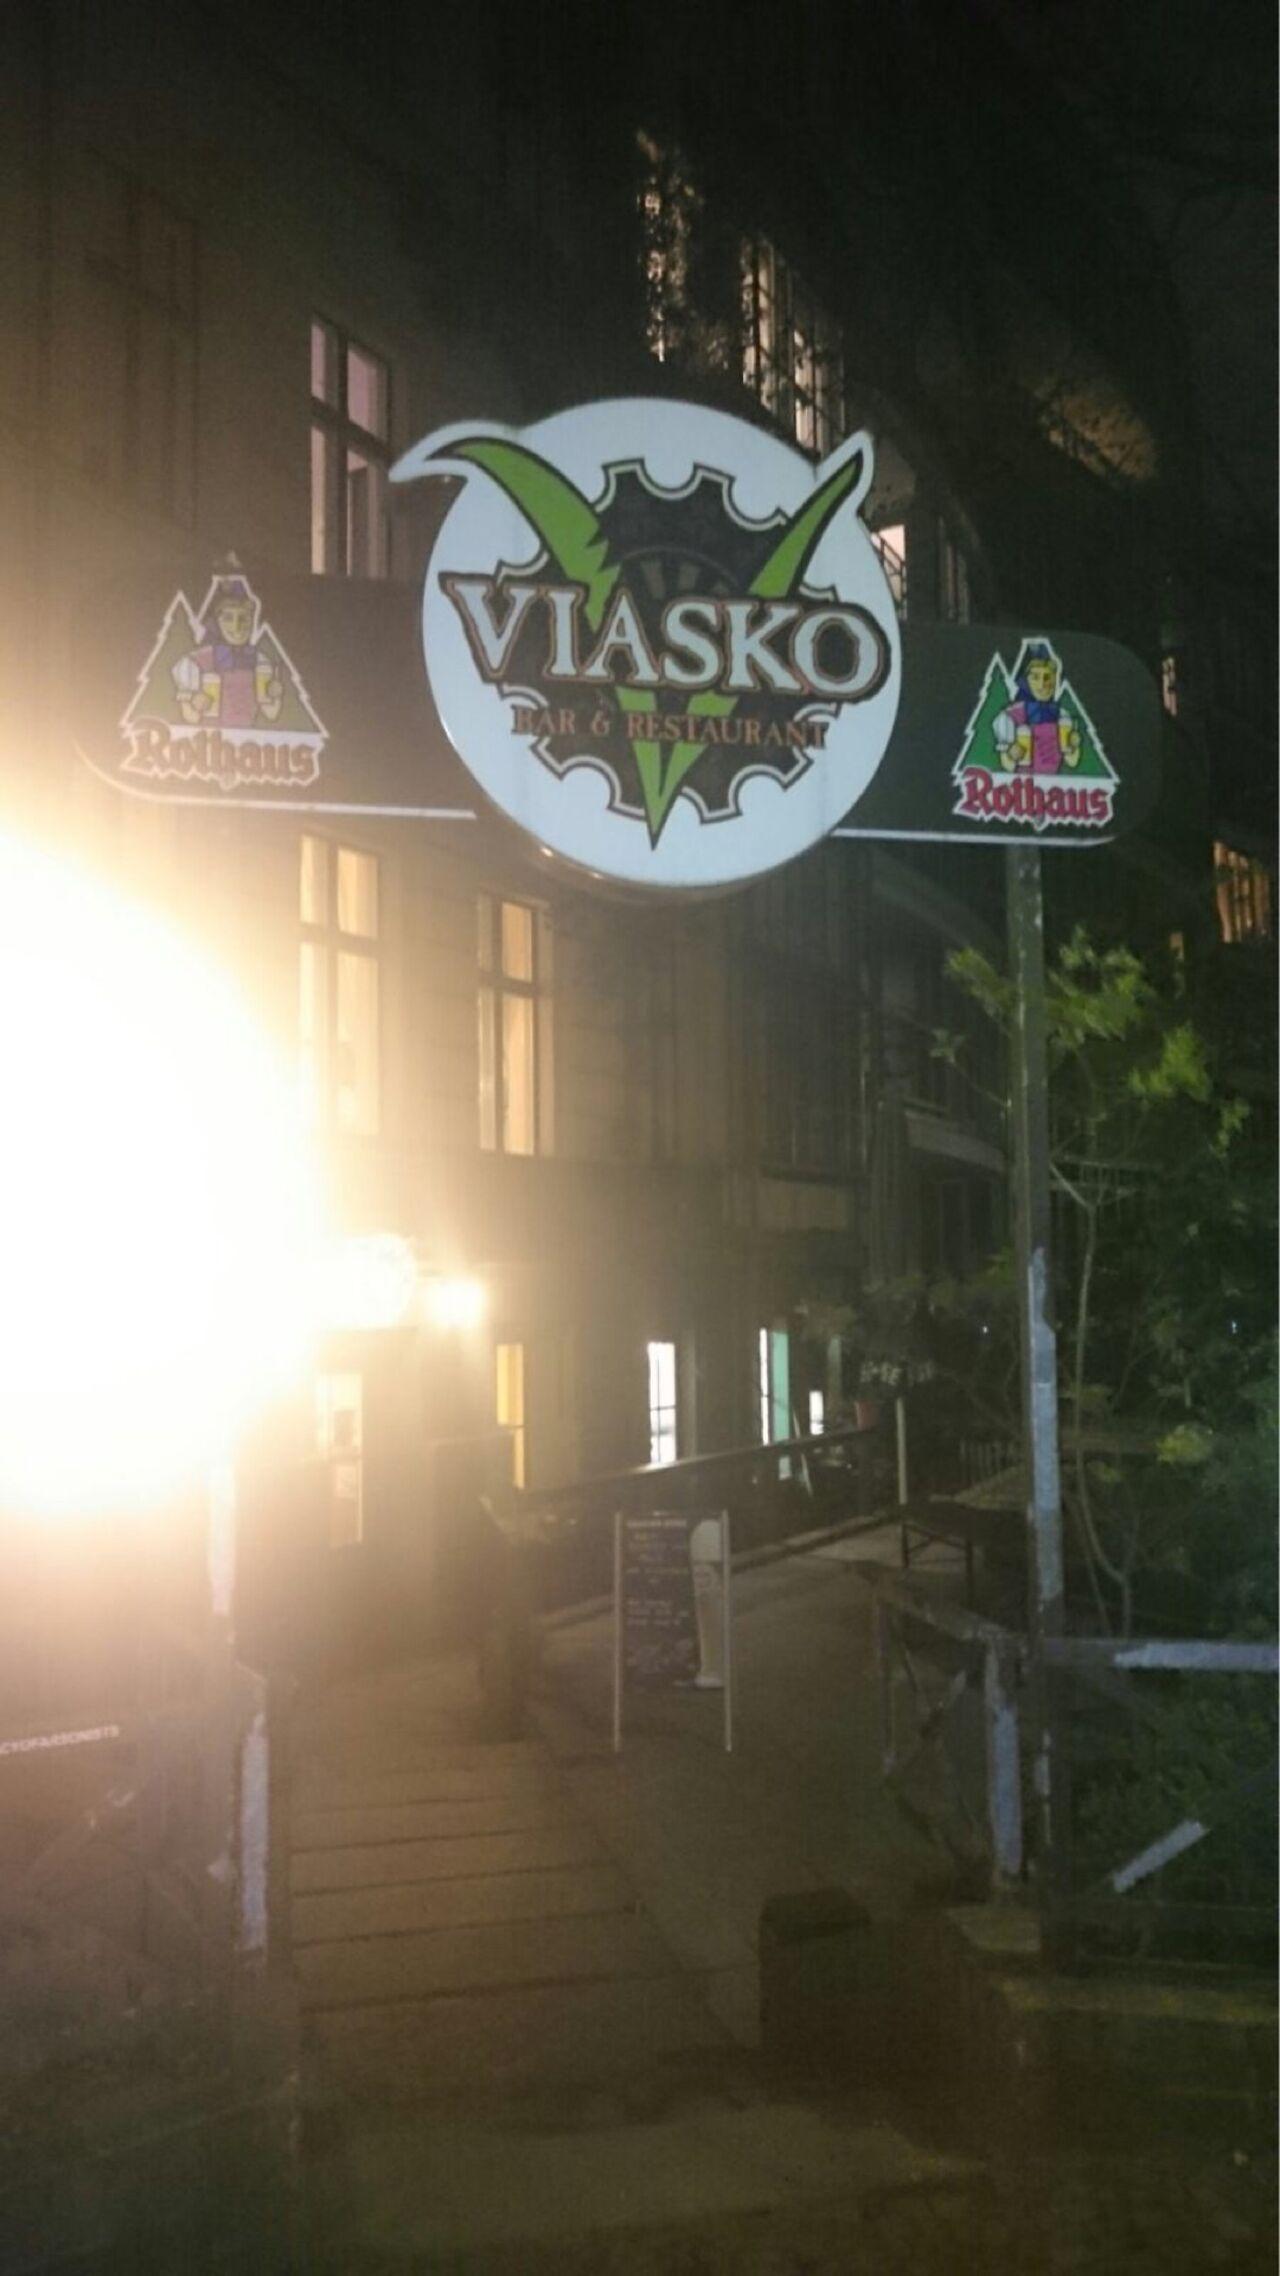 A photo of Viasko